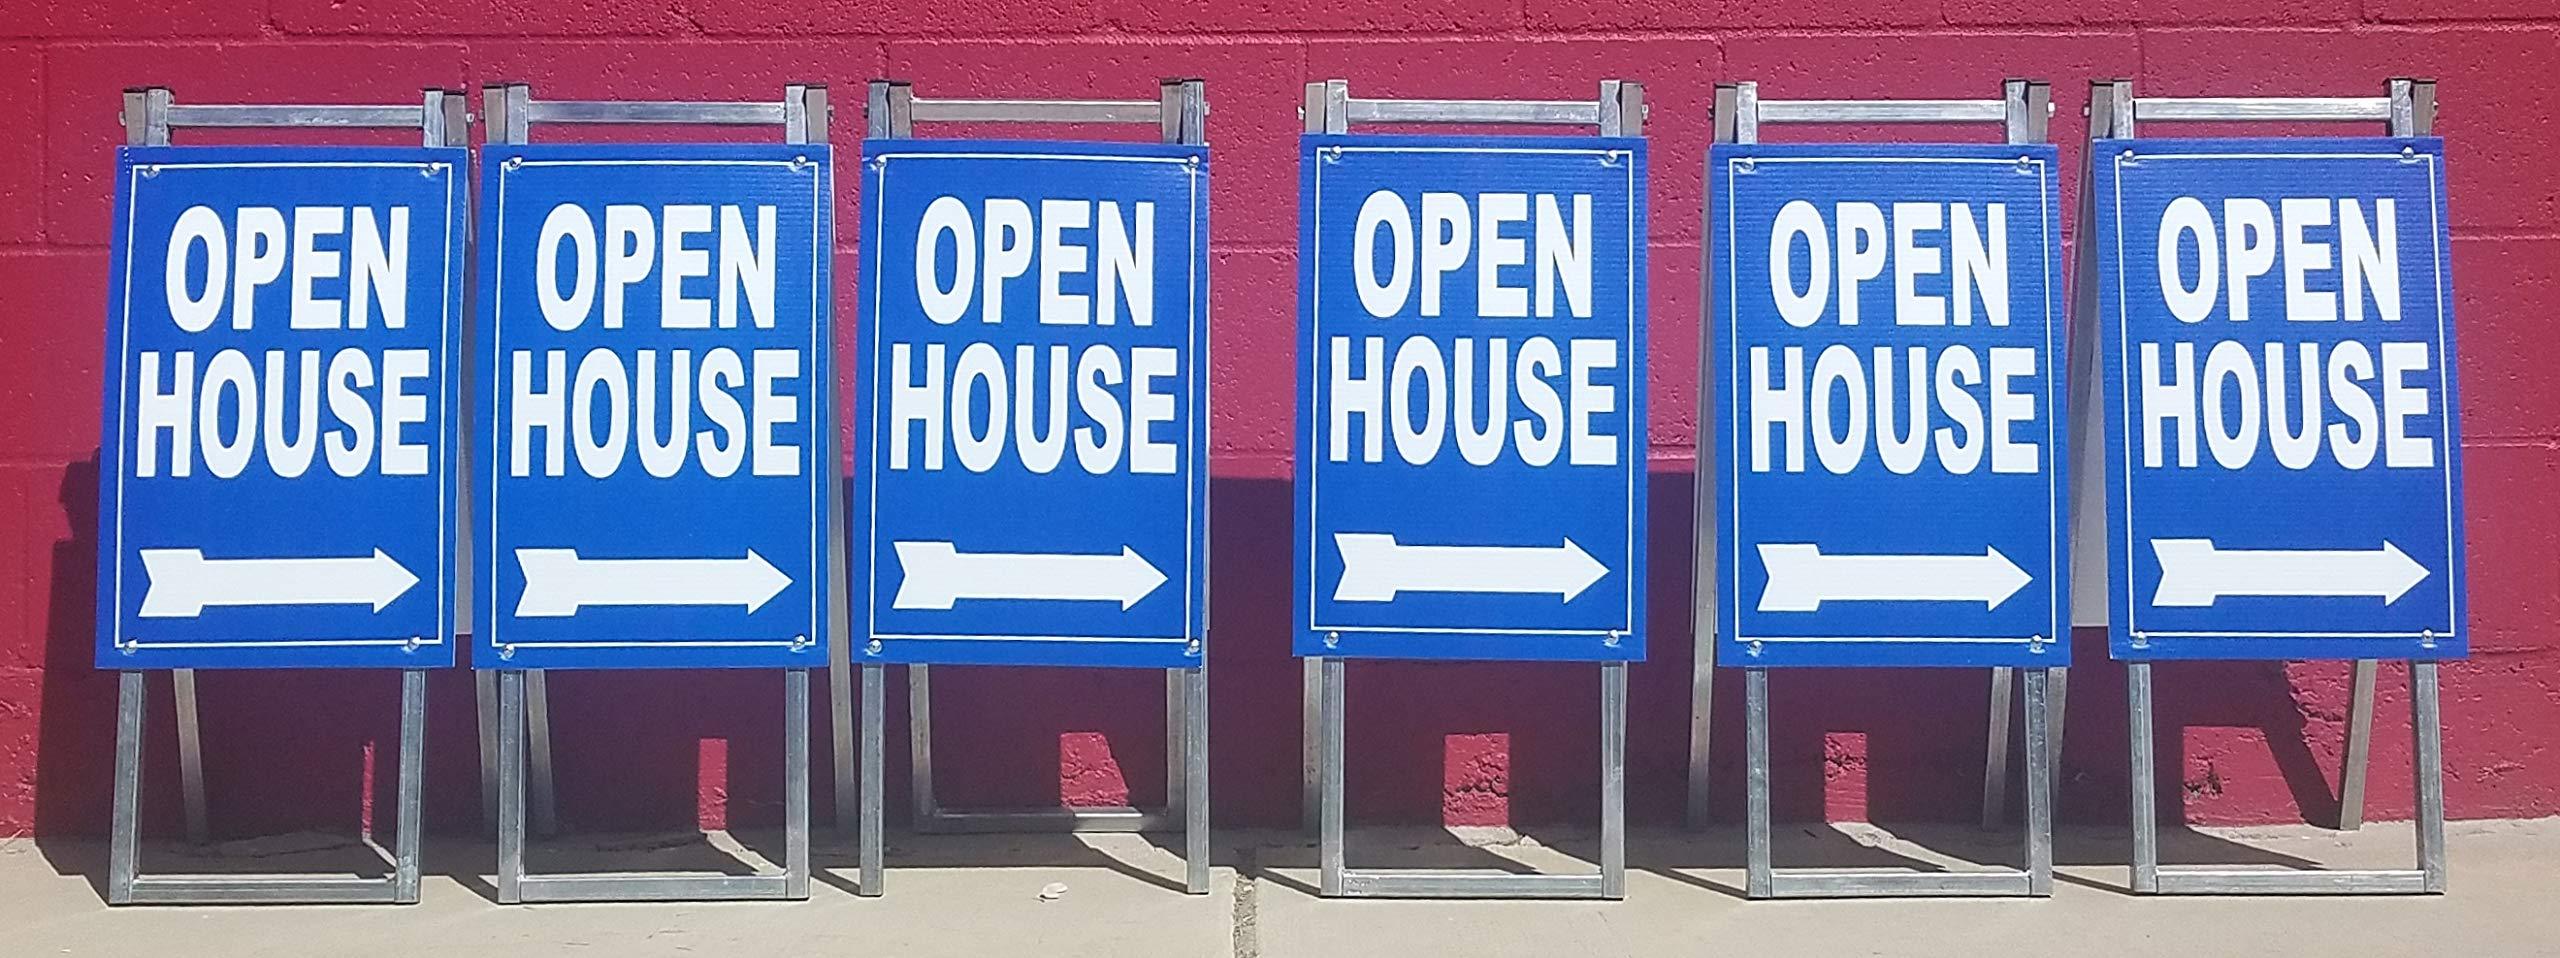 EZee Post Mini Open House Signs 6-Pack Kit Blue